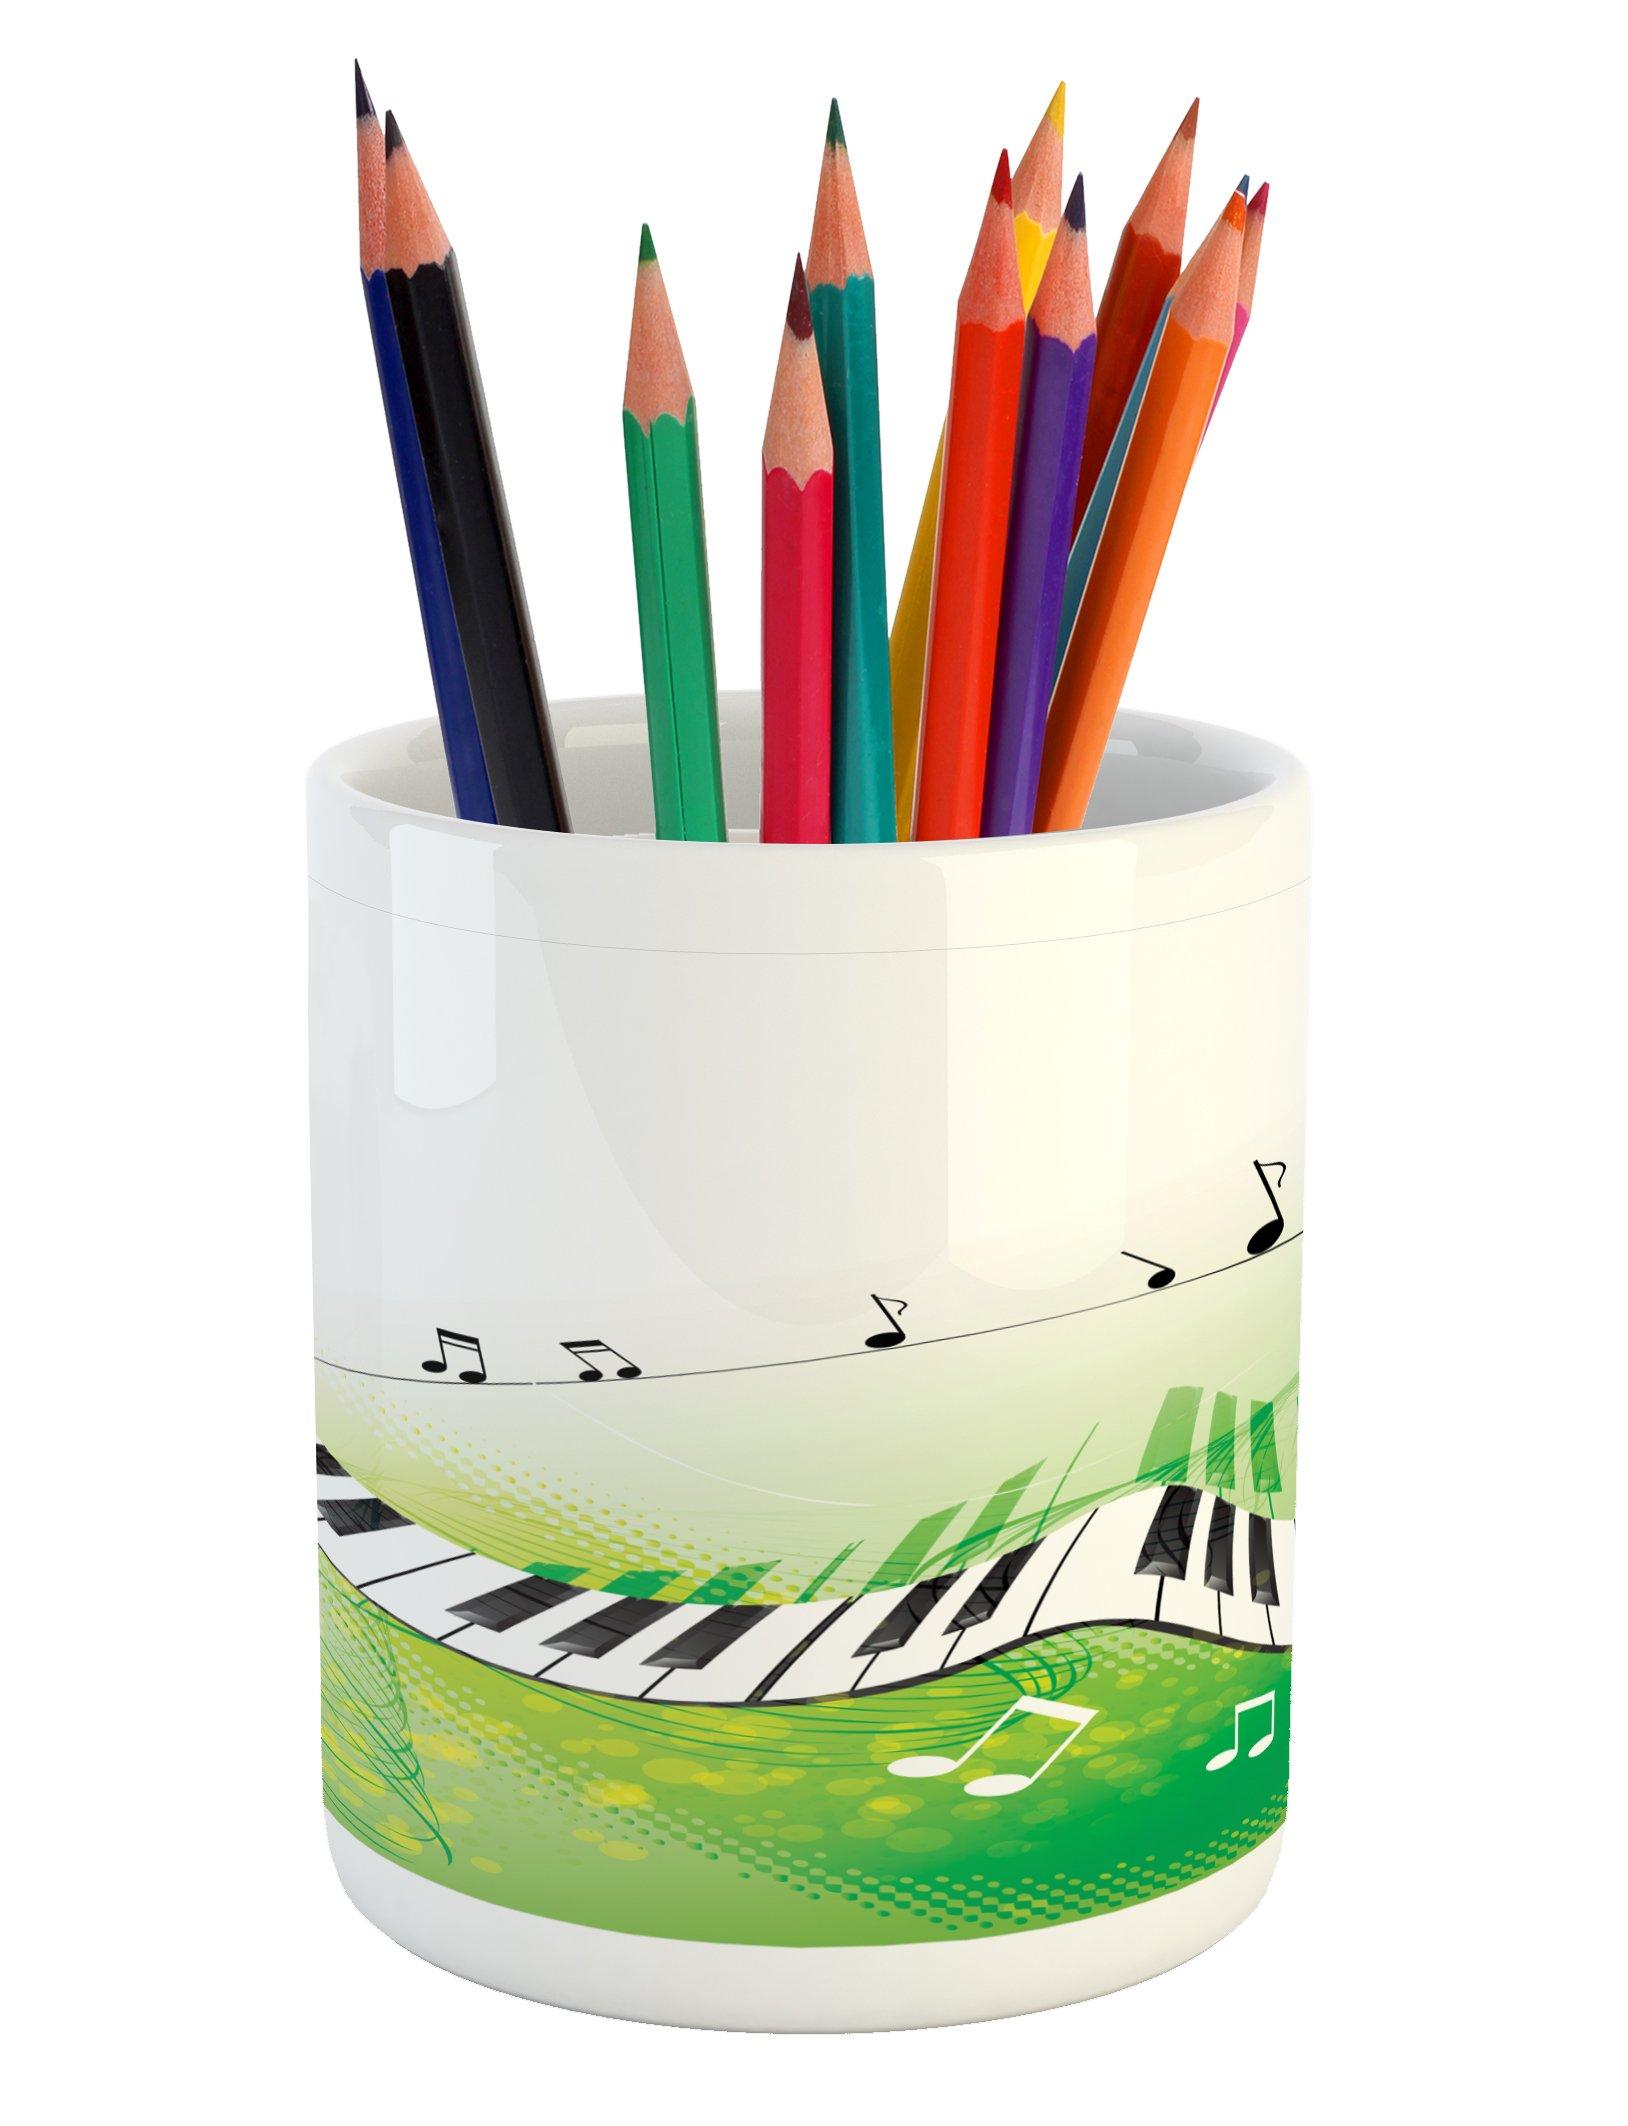 Ambesonne Music Pencil Pen Holder, Music Piano Keys Curvy Fingerboard Summertime Entertainment Flourish, Printed Ceramic Pencil Pen Holder for Desk Office Accessory, Lime Green Black White